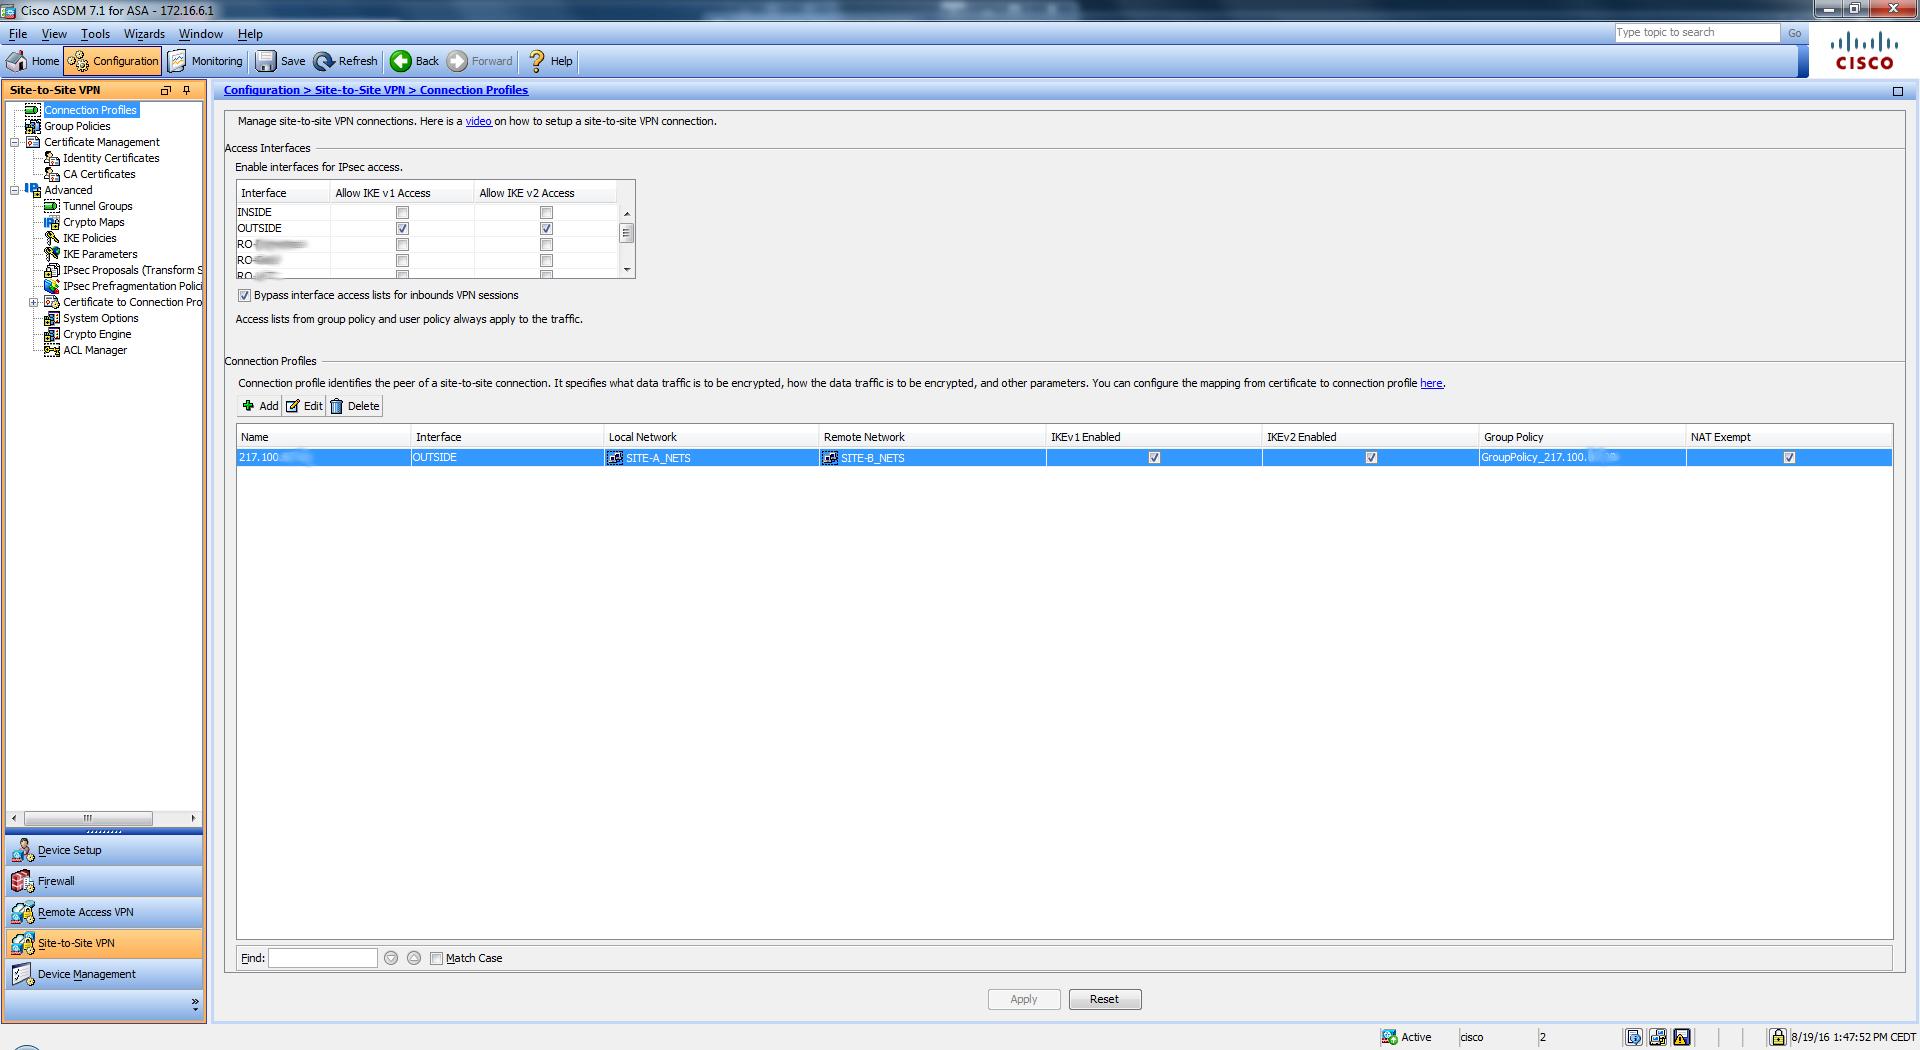 Cyberoam ssl vpn client auth_failed